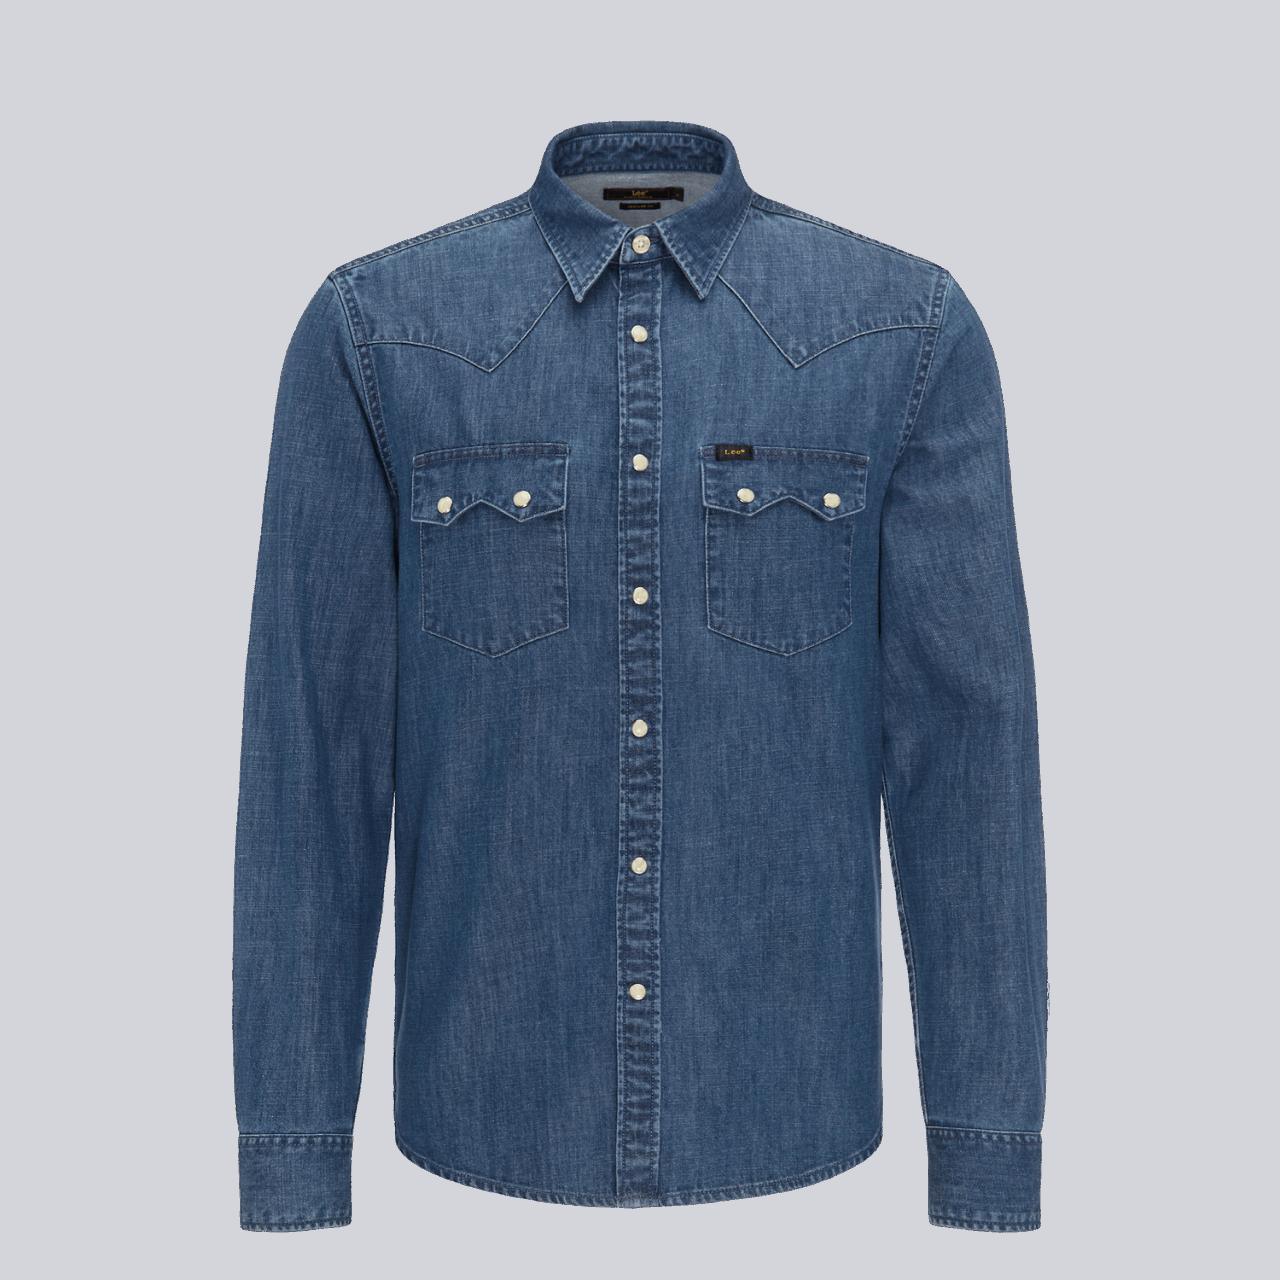 LEE Rider Shirt - Dipped Blue